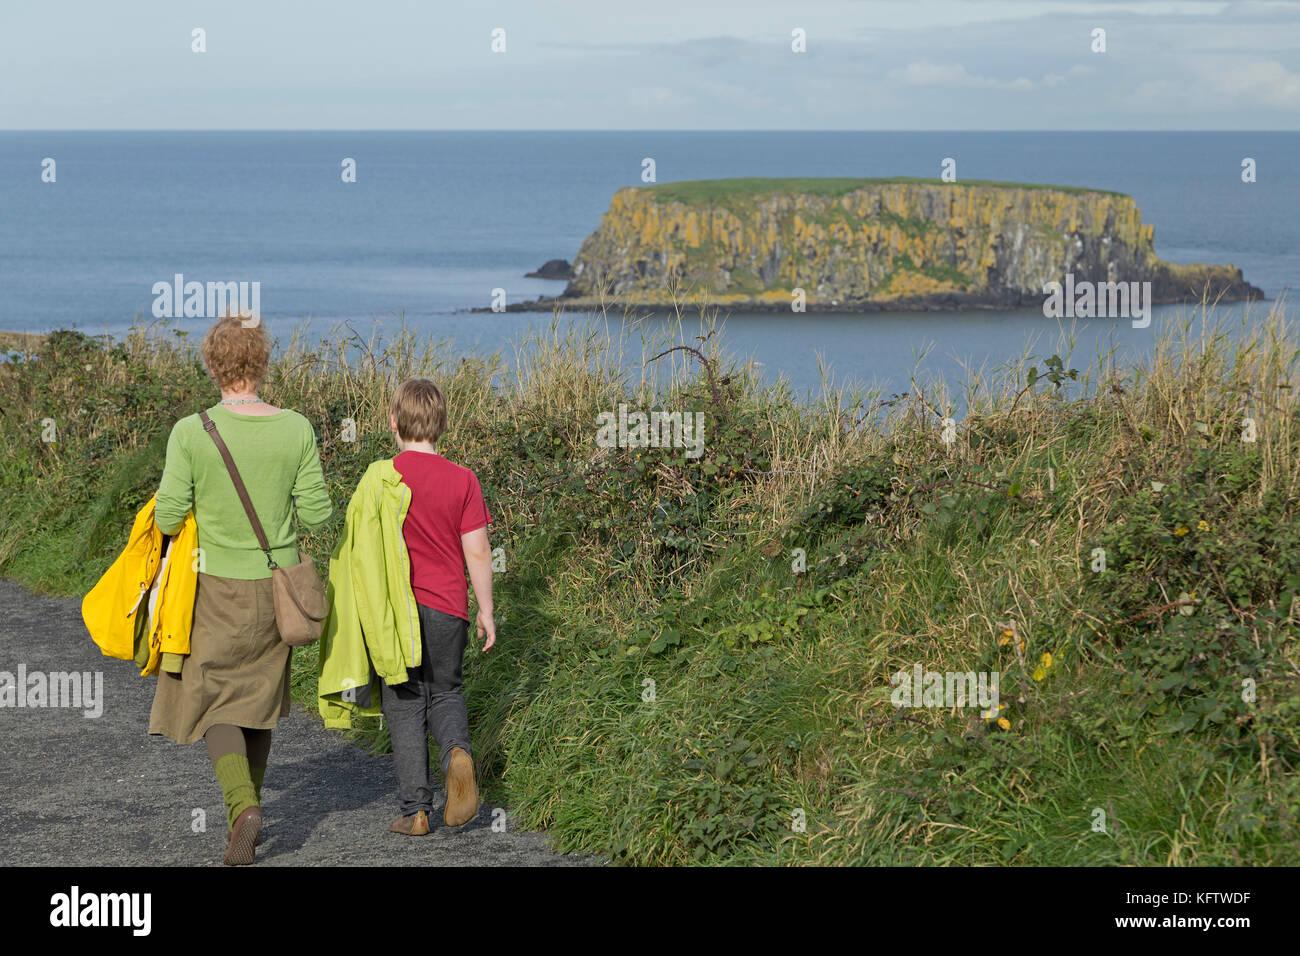 Sheep Island, Carrick-a-Rede Rope Bridge, Ballintoy, Co. Antrim, Northern Ireland - Stock Image